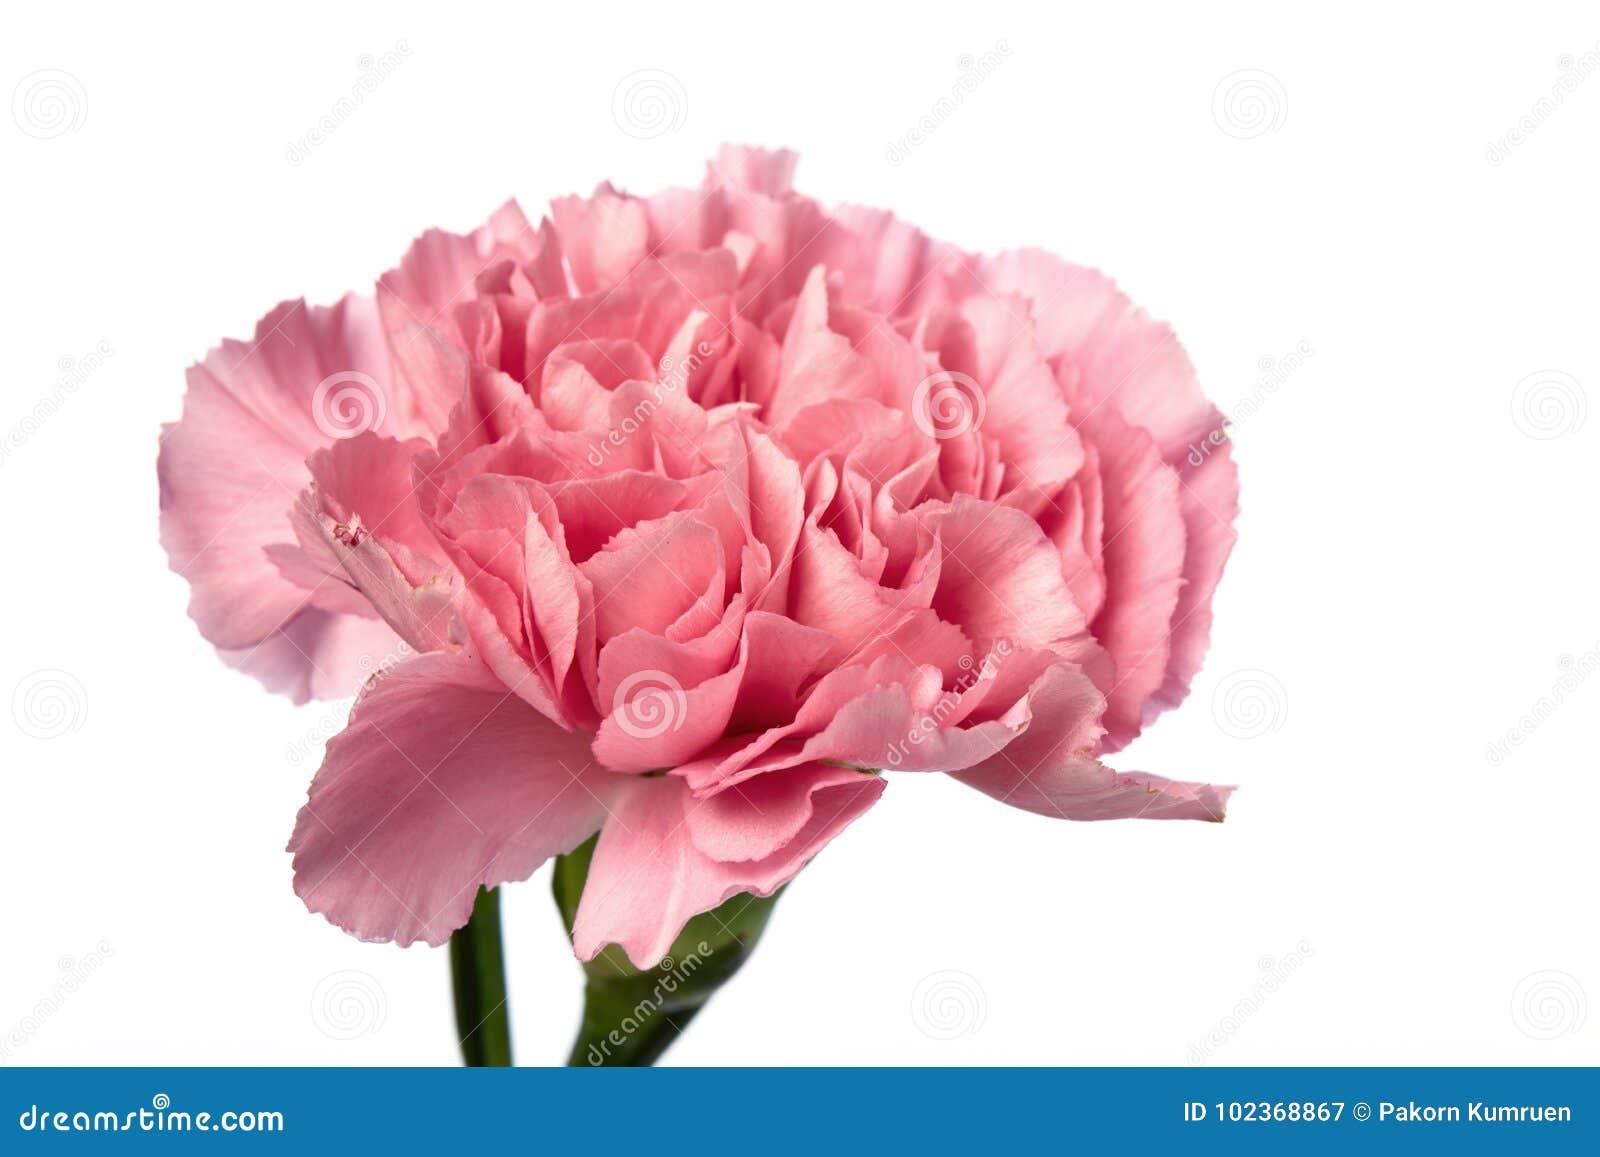 Pink carnation flower on white stock image image of romance flat pink carnation flower on white mightylinksfo